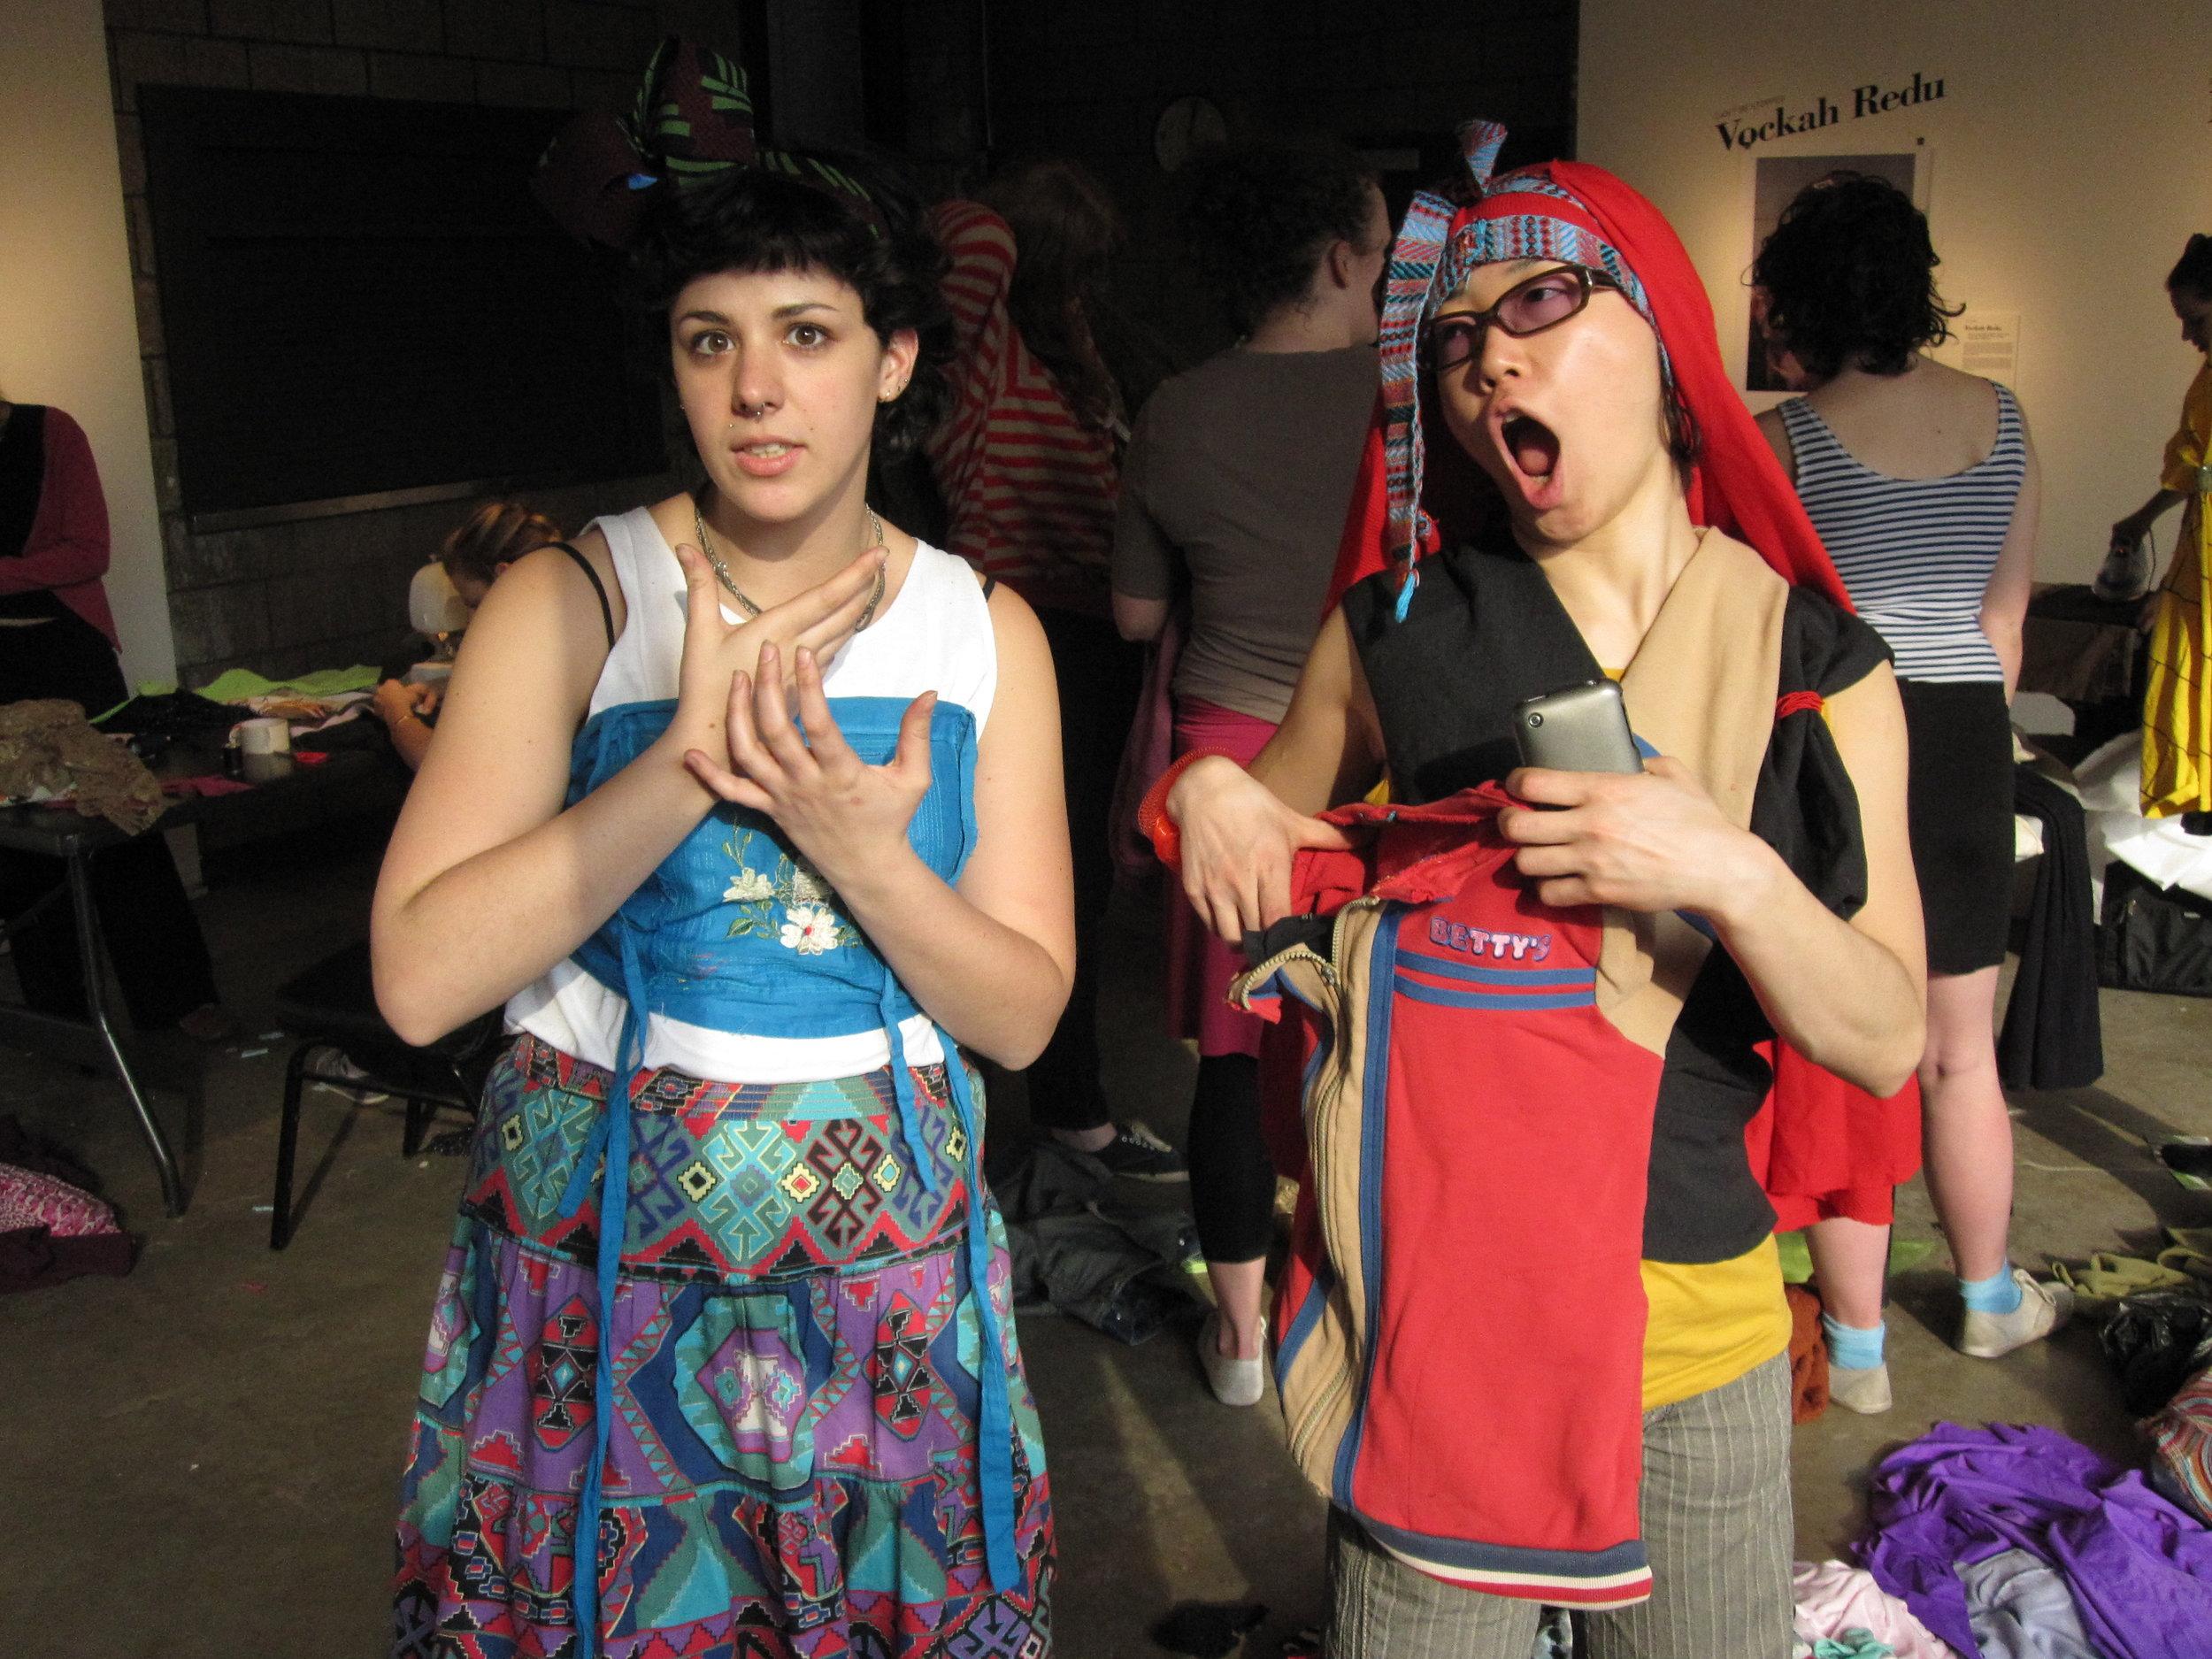 clothing-remake-marathon_4460282422_o.jpg